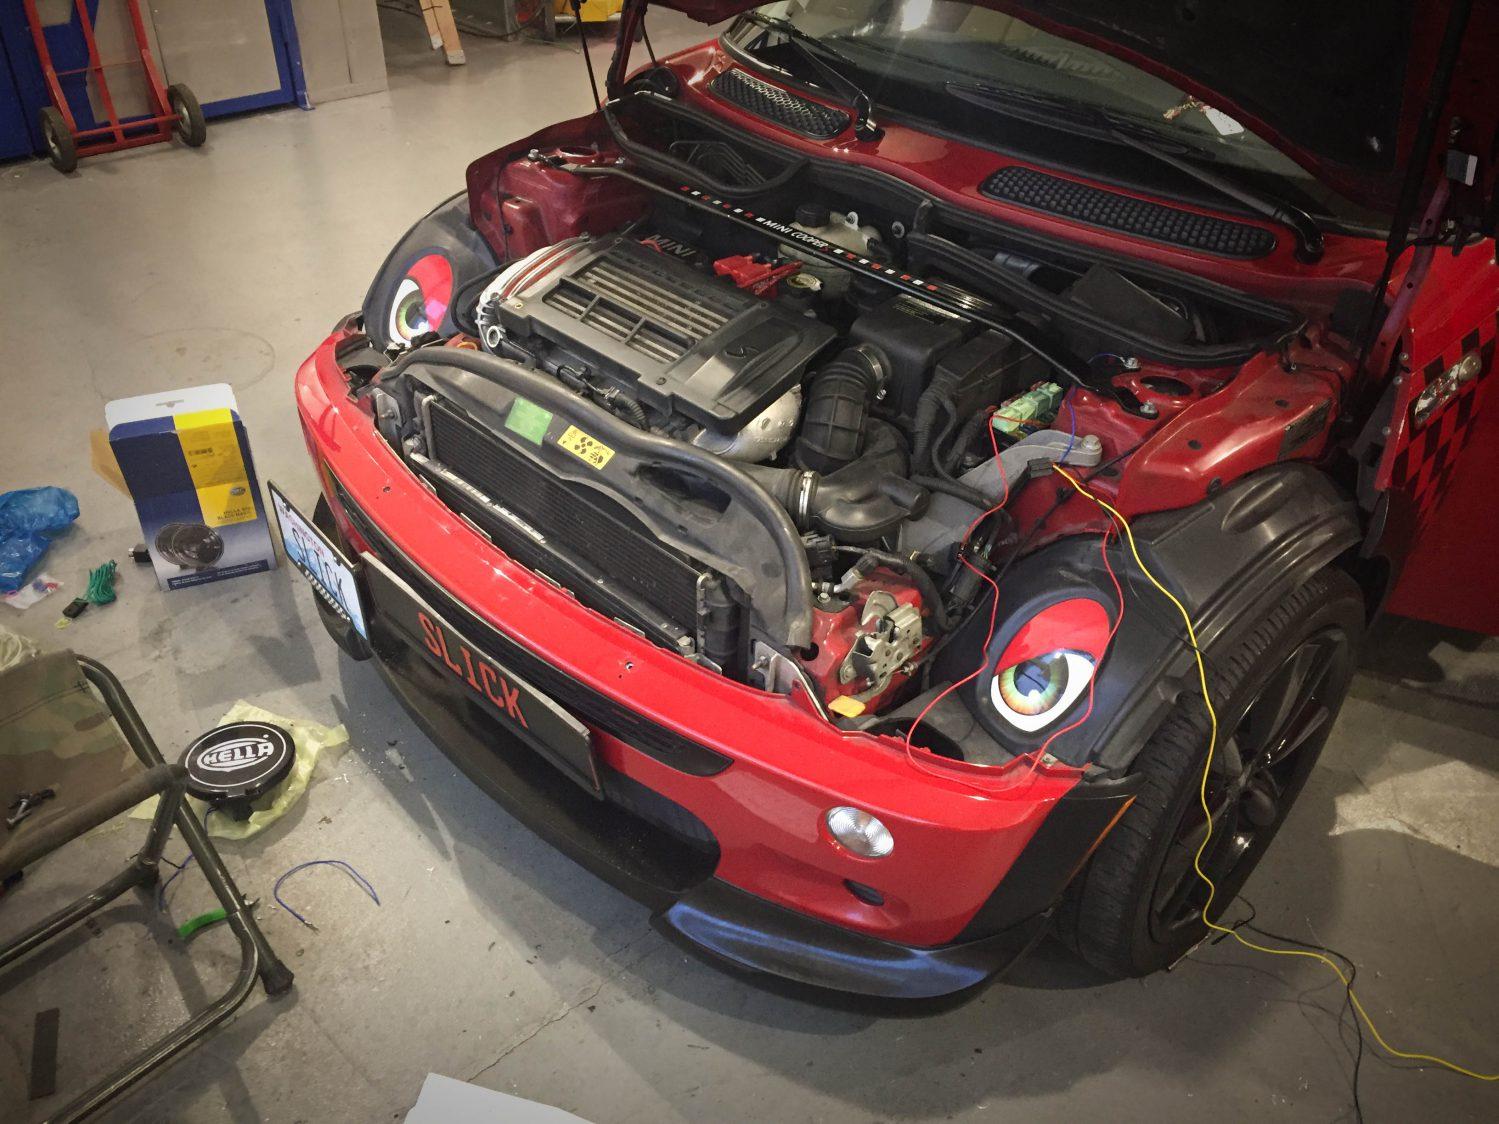 2005 Mini Cooper S Fog Light Install Meister Werks Renton Auto Lights Wiring Diagram